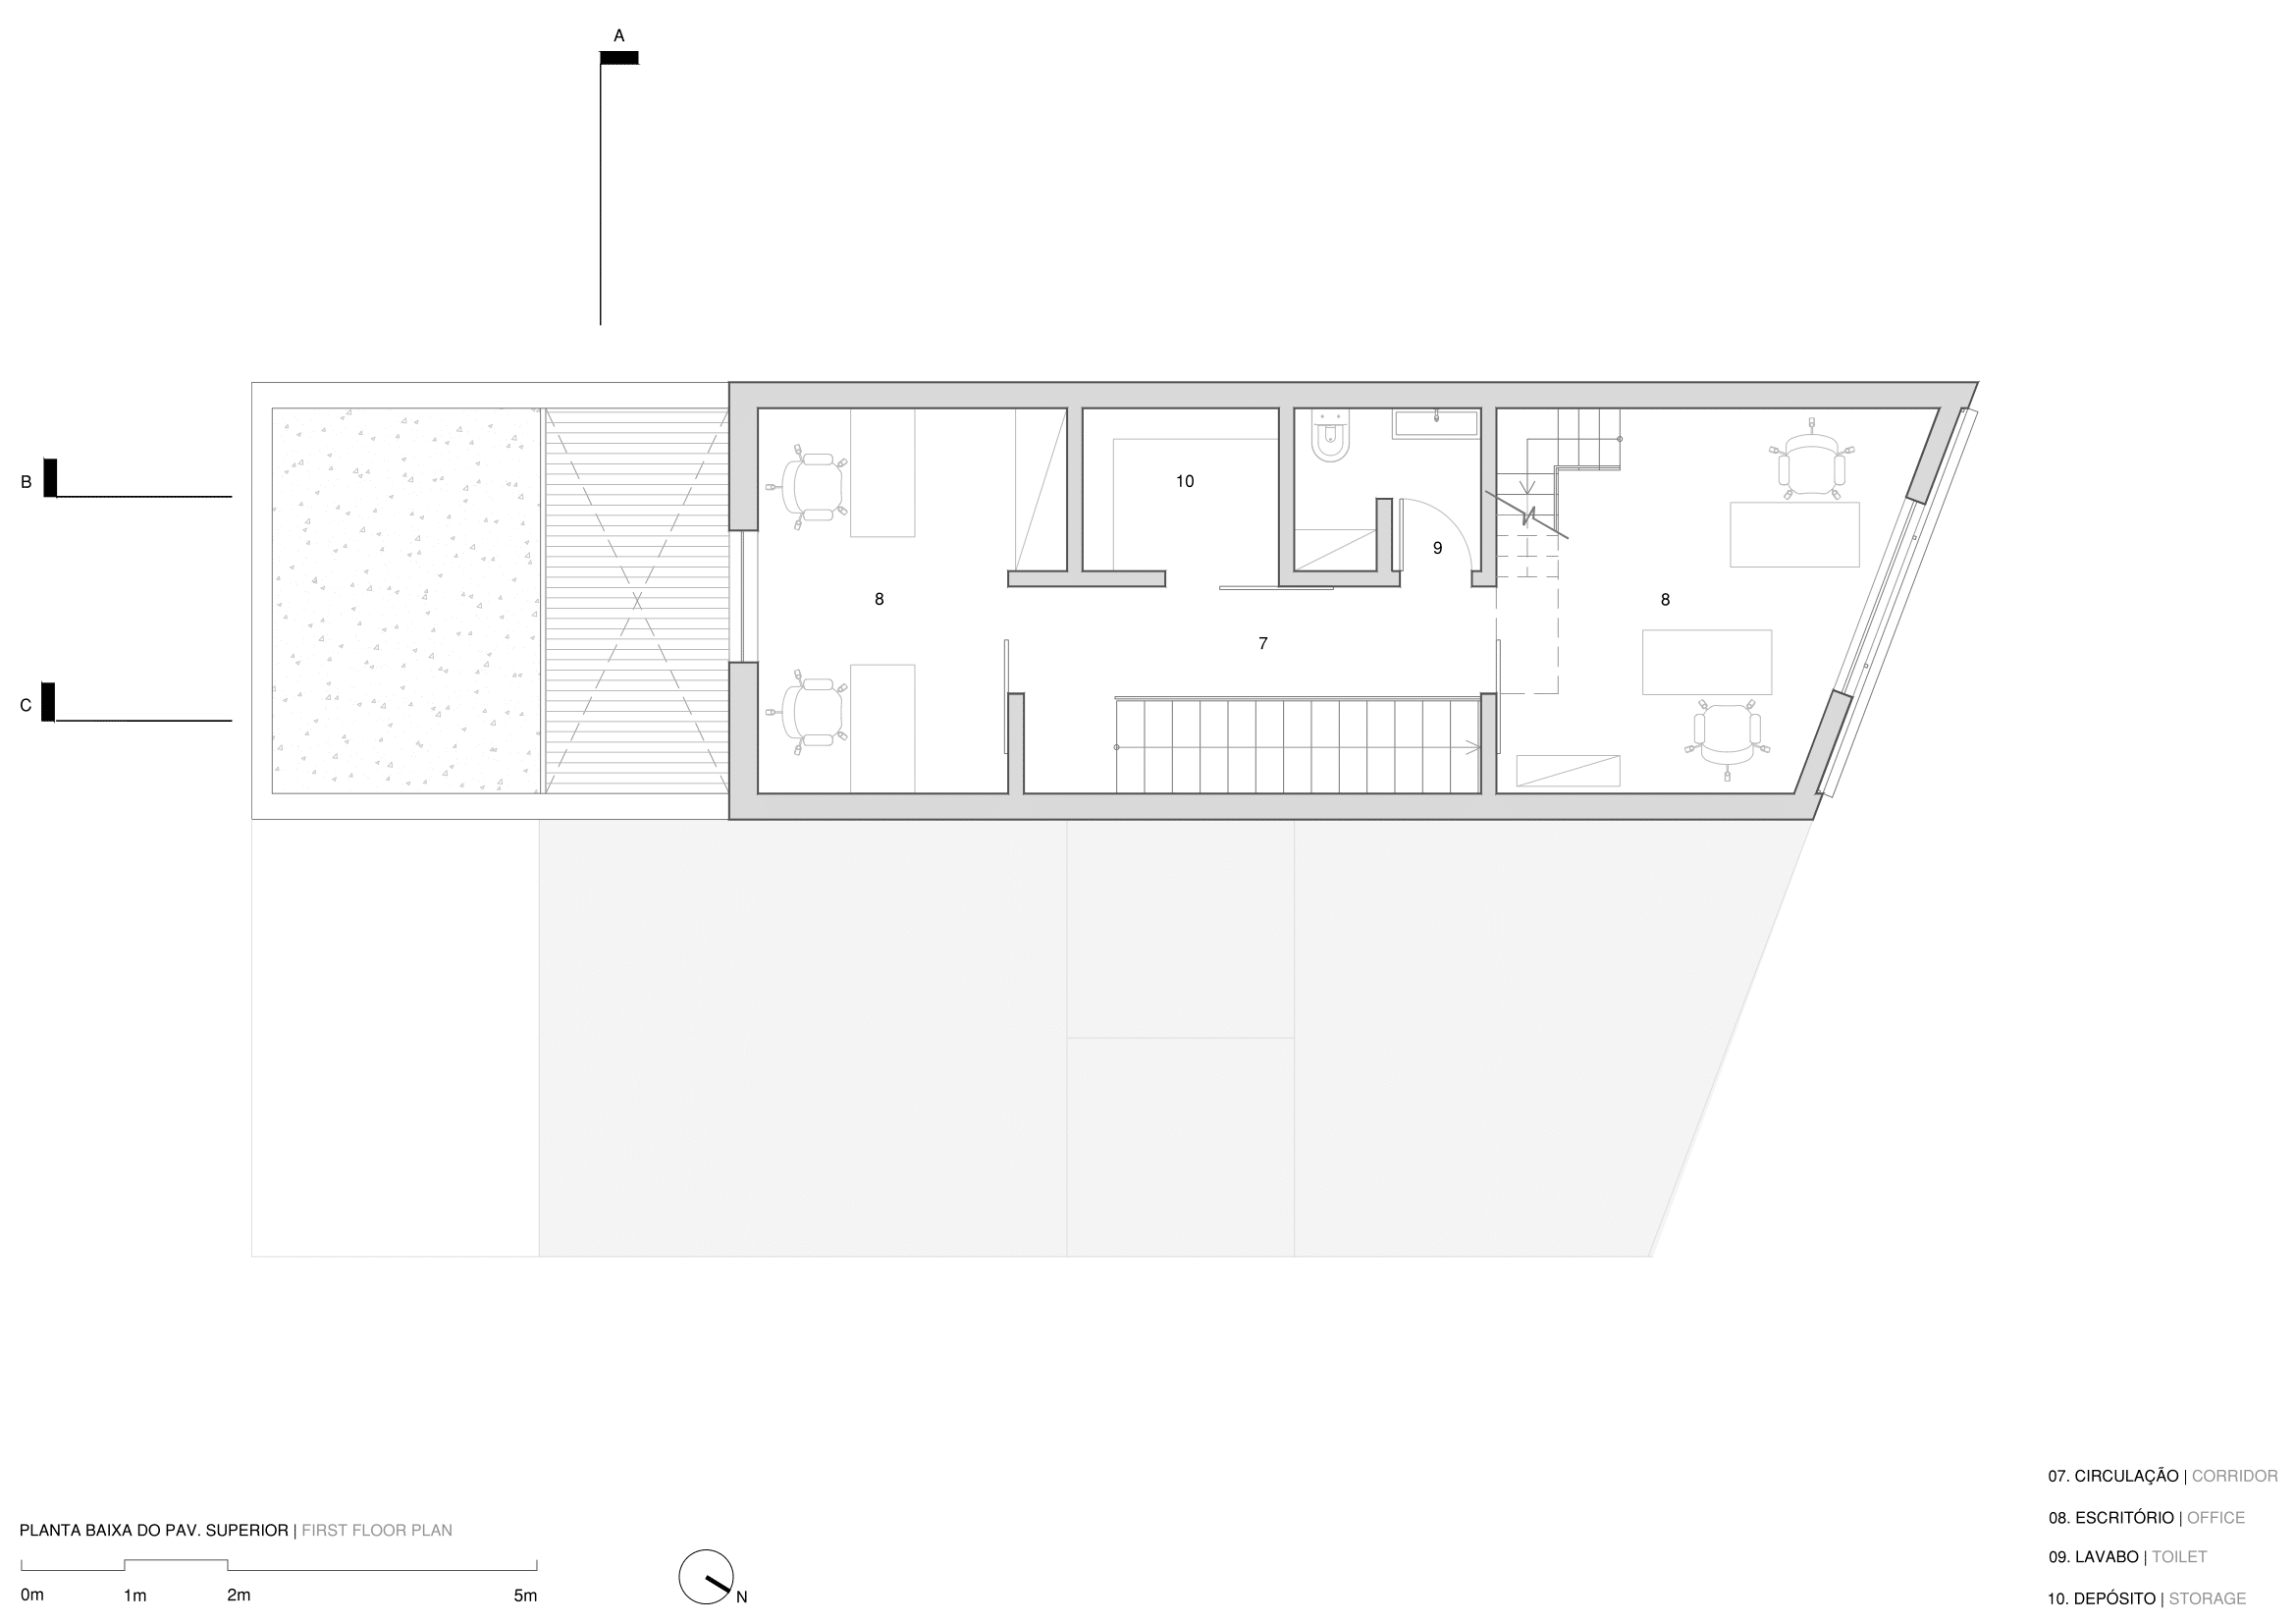 hobjeto-arquitetura-produtora-velloni-ap-02-pbsup